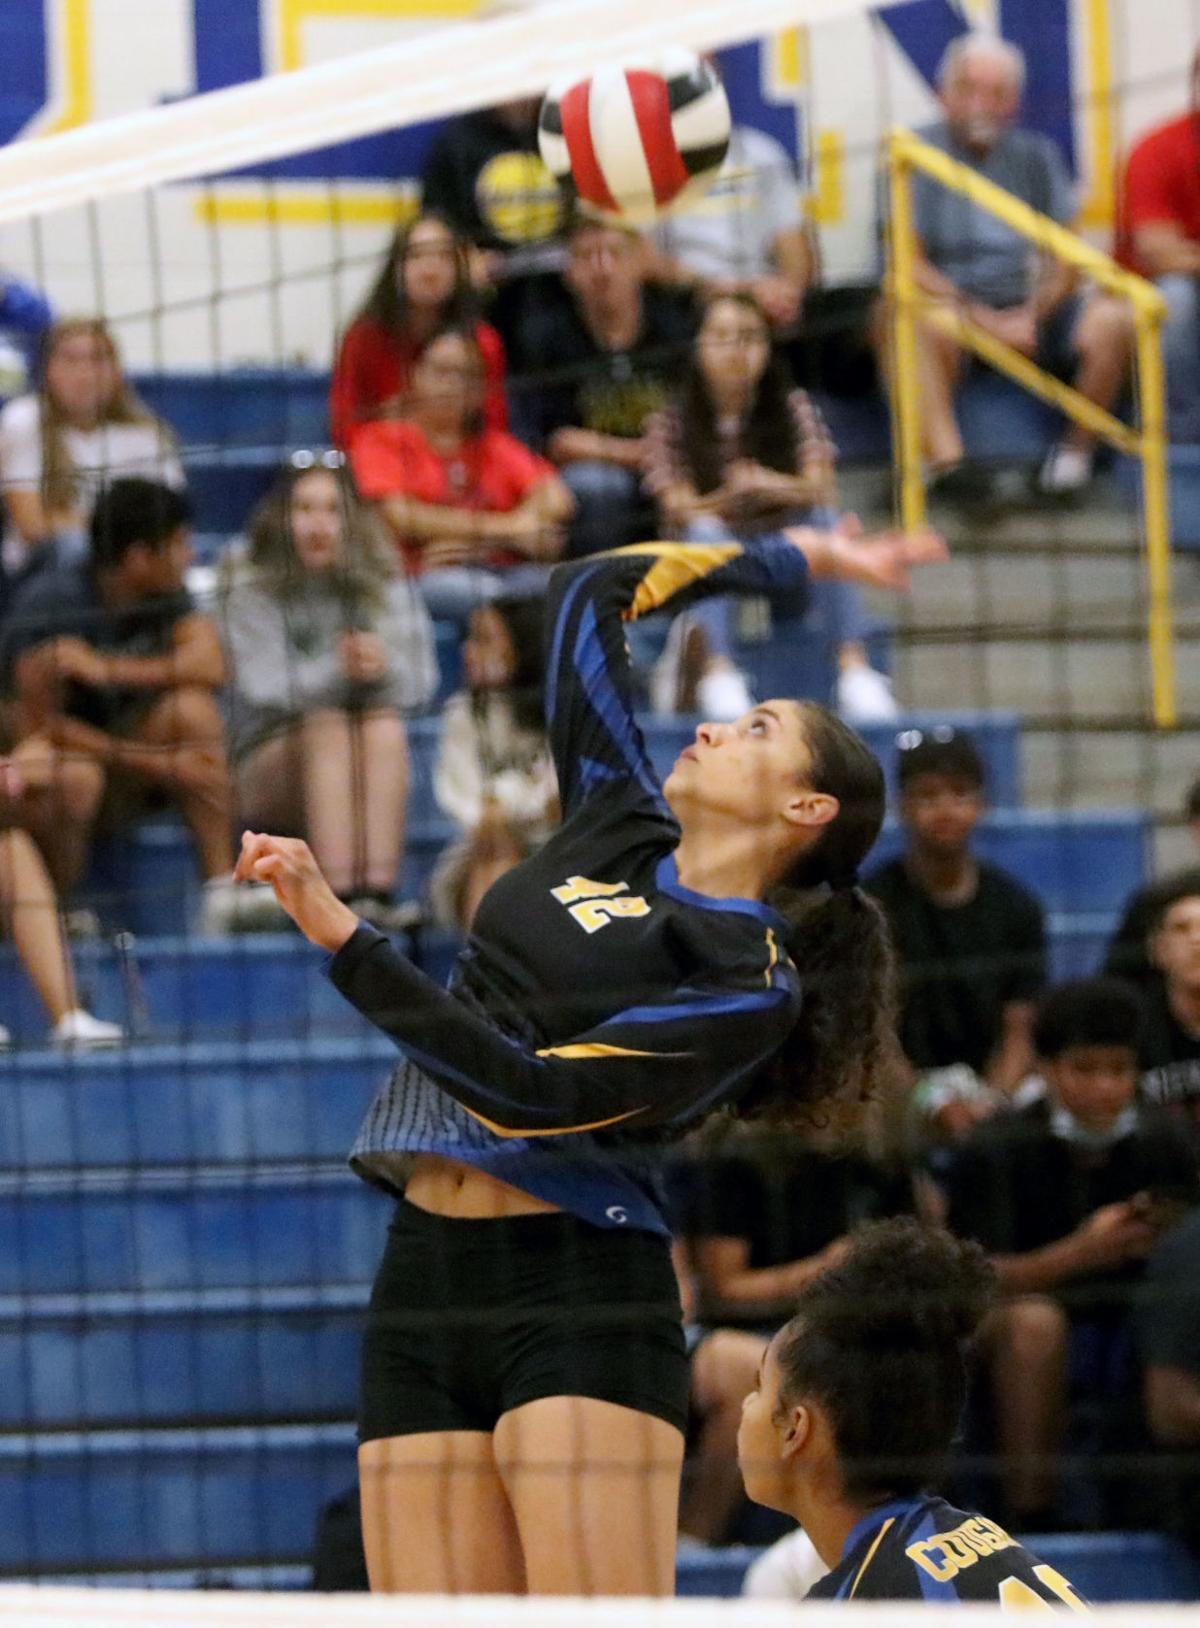 Volleyball: CG Union vs. Catalina Foothills 9/21/21